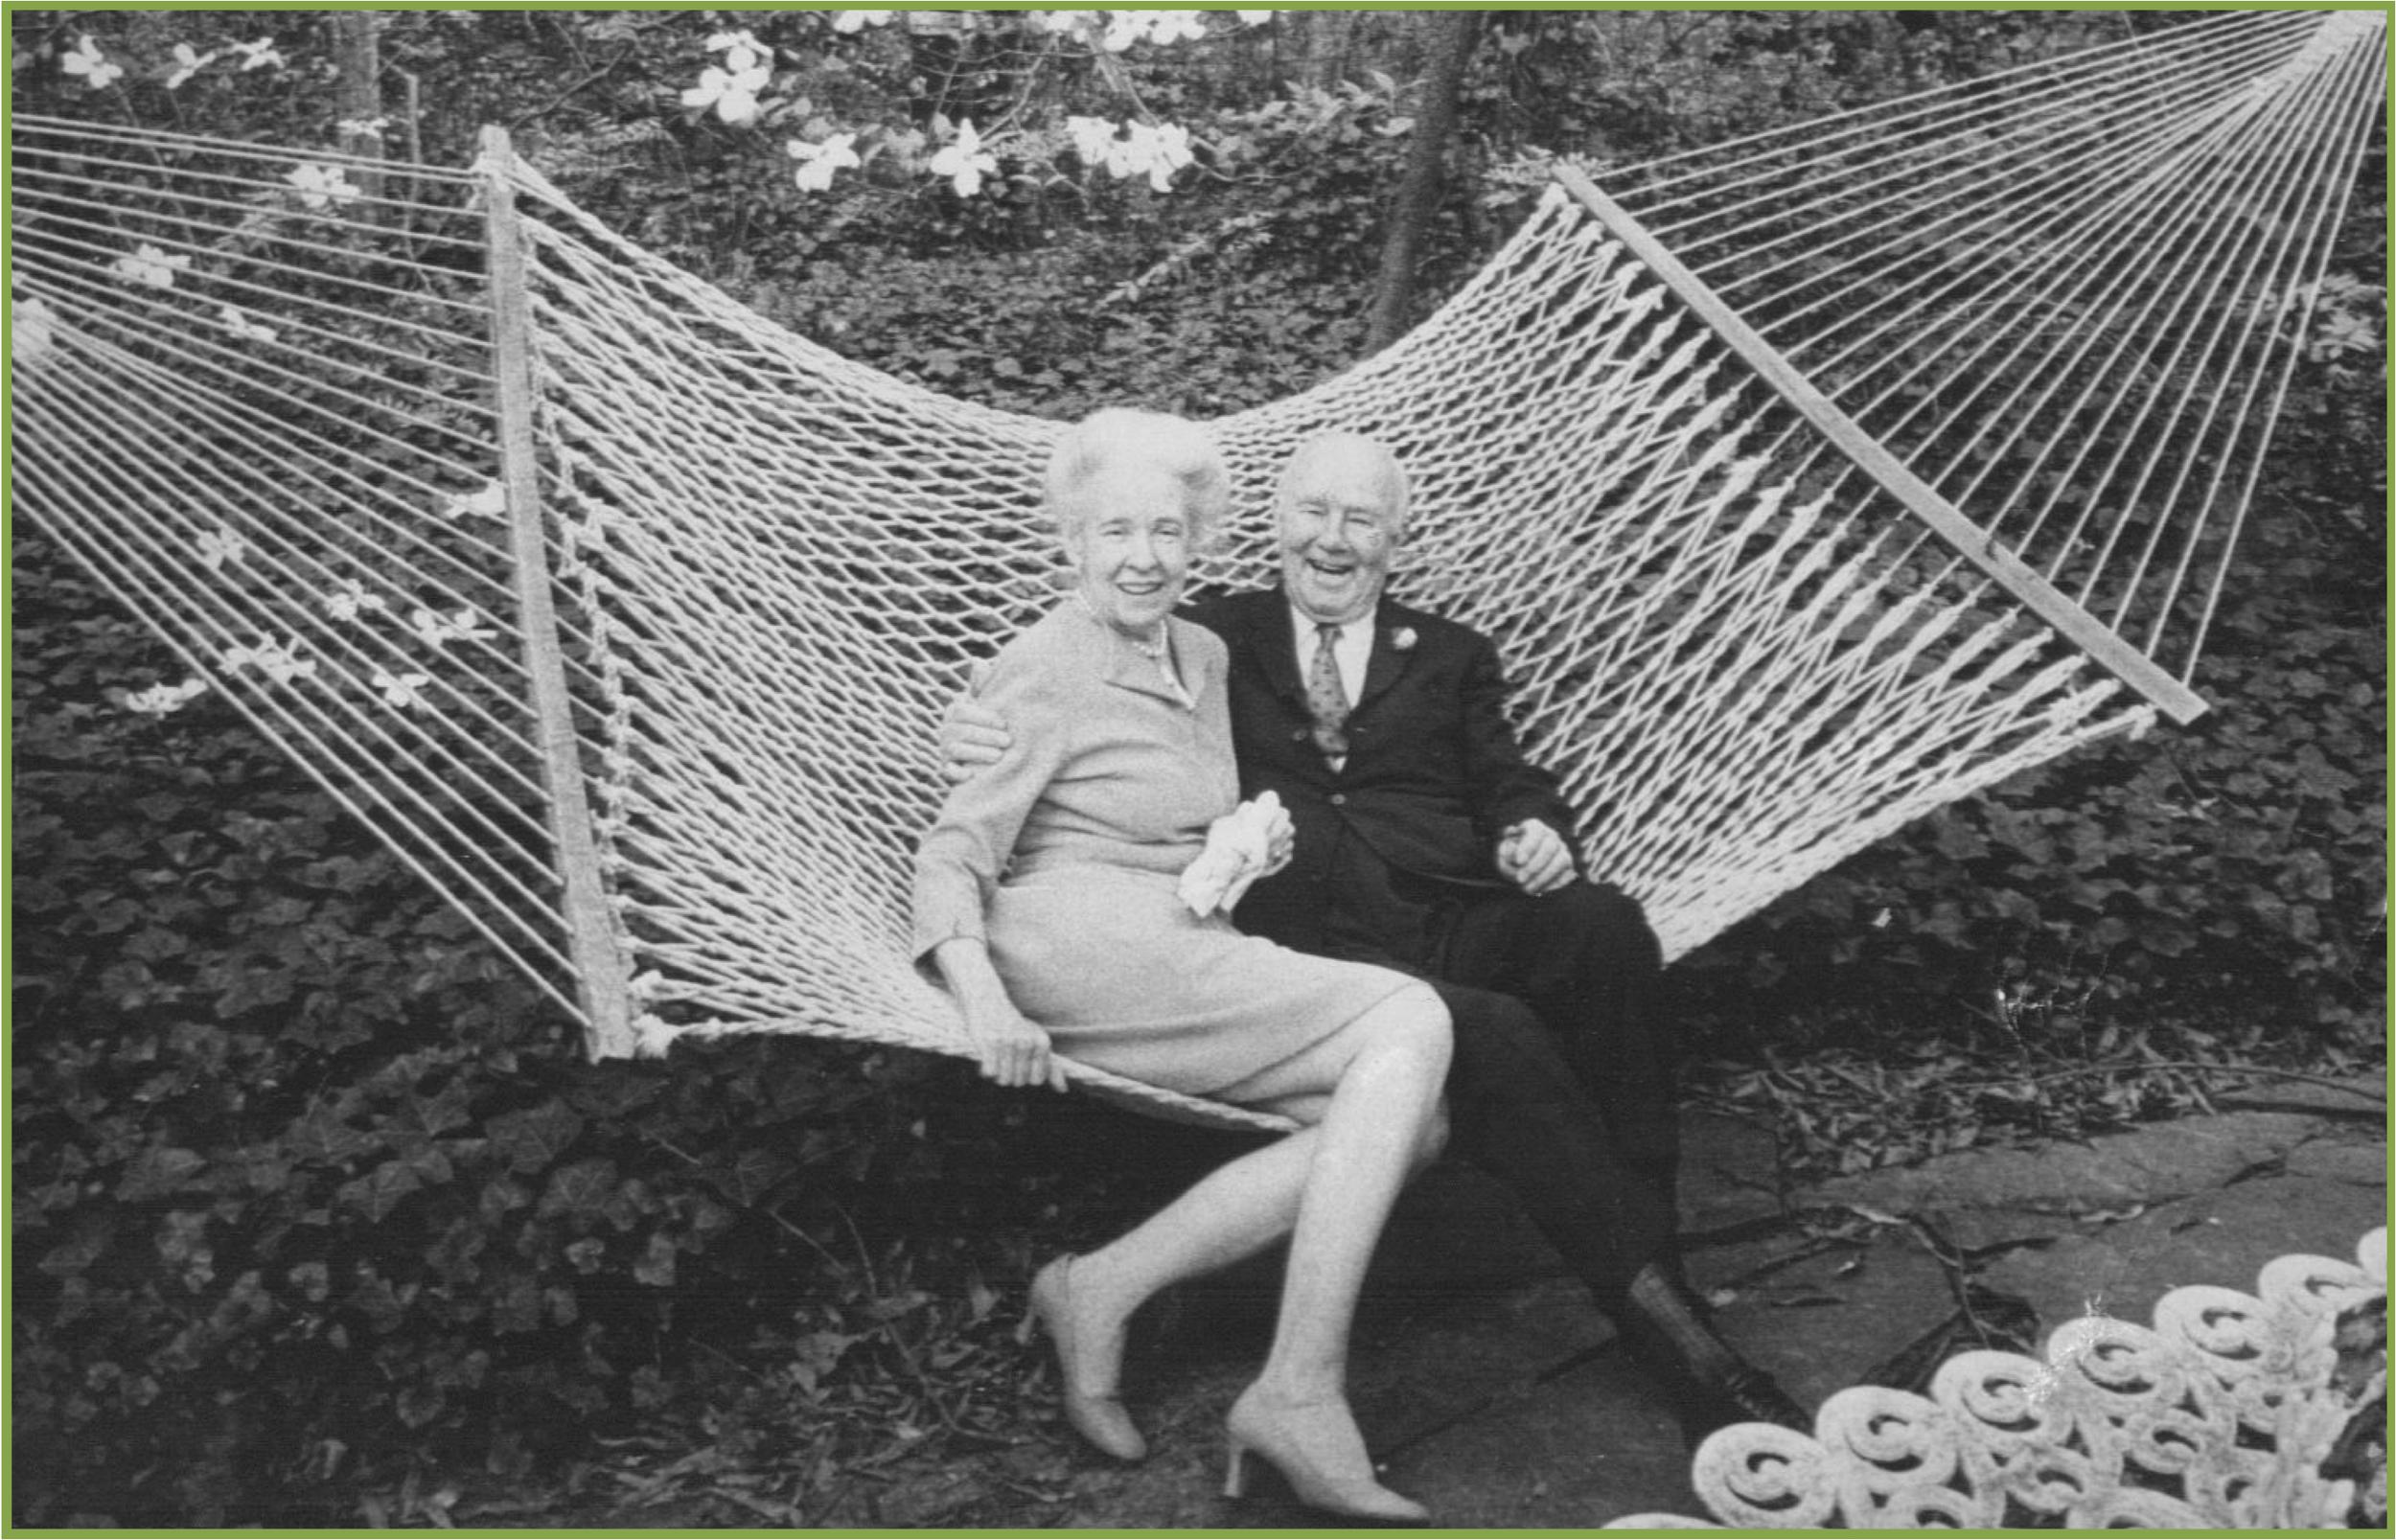 Elizabeth and Eddie Clarkson at home in their garden, 1979 (c) Andrea Sprott